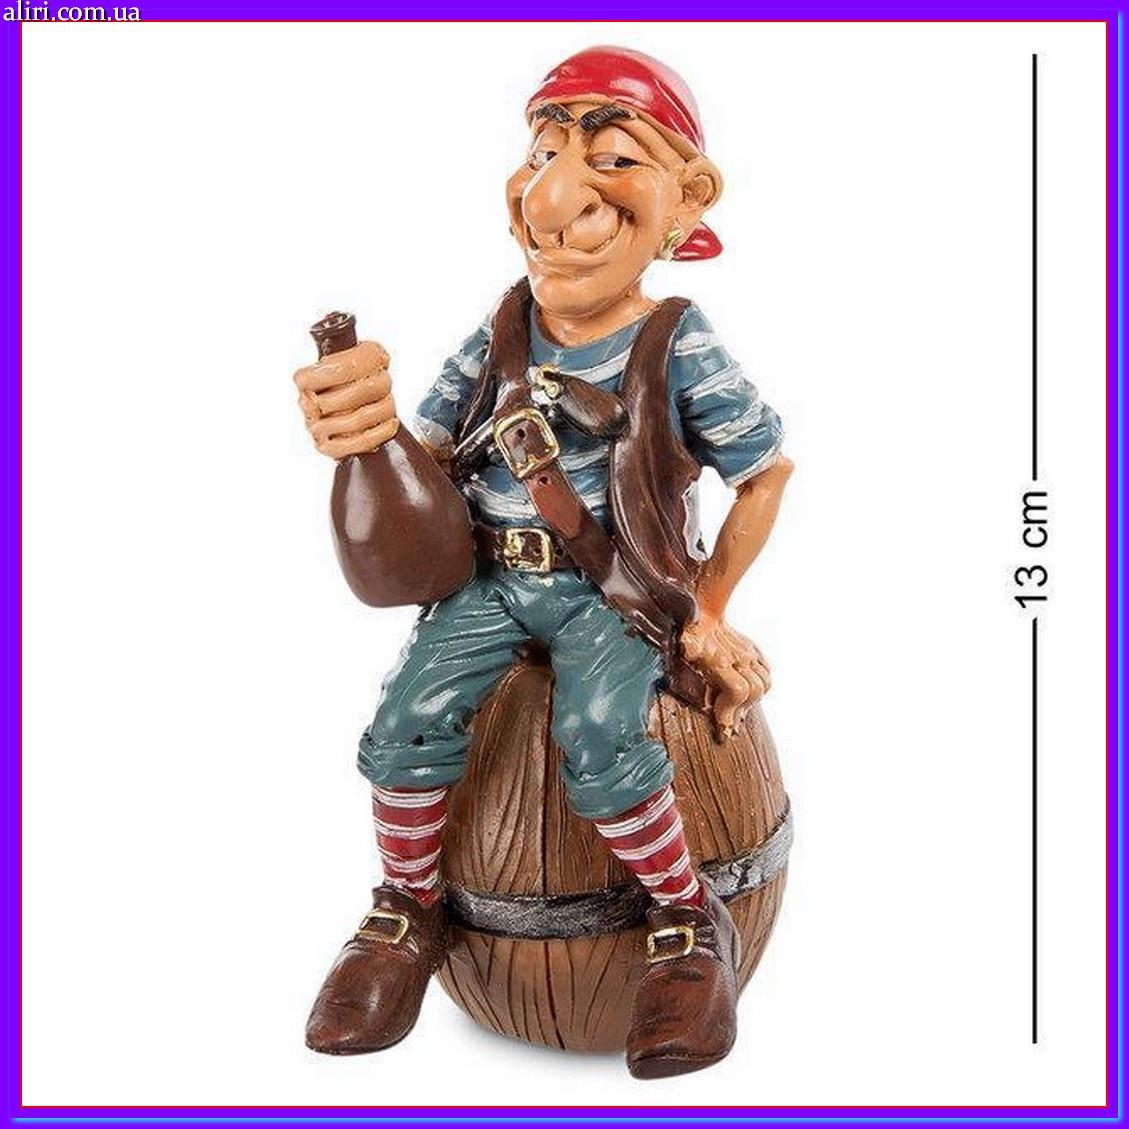 Фигурка статуэтка Пират Взрывной Бен W.Stratford 13см, фото 1